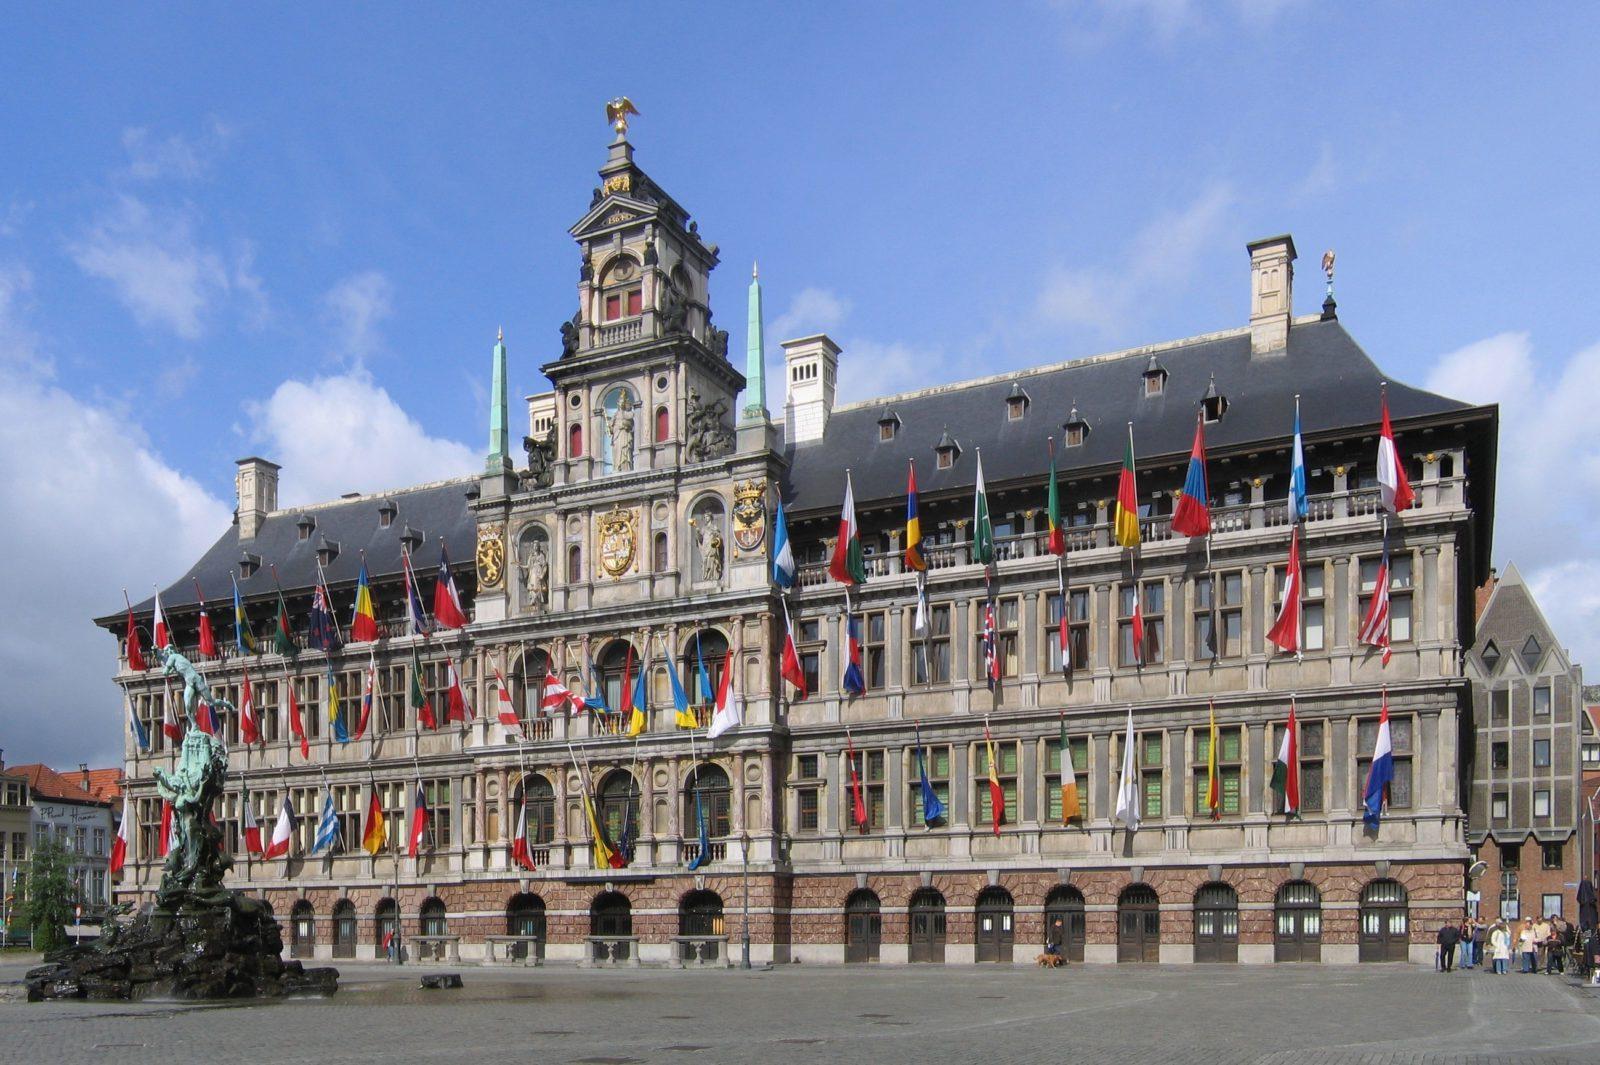 Antwerpen Stadhuis Crop4 2006 05 28